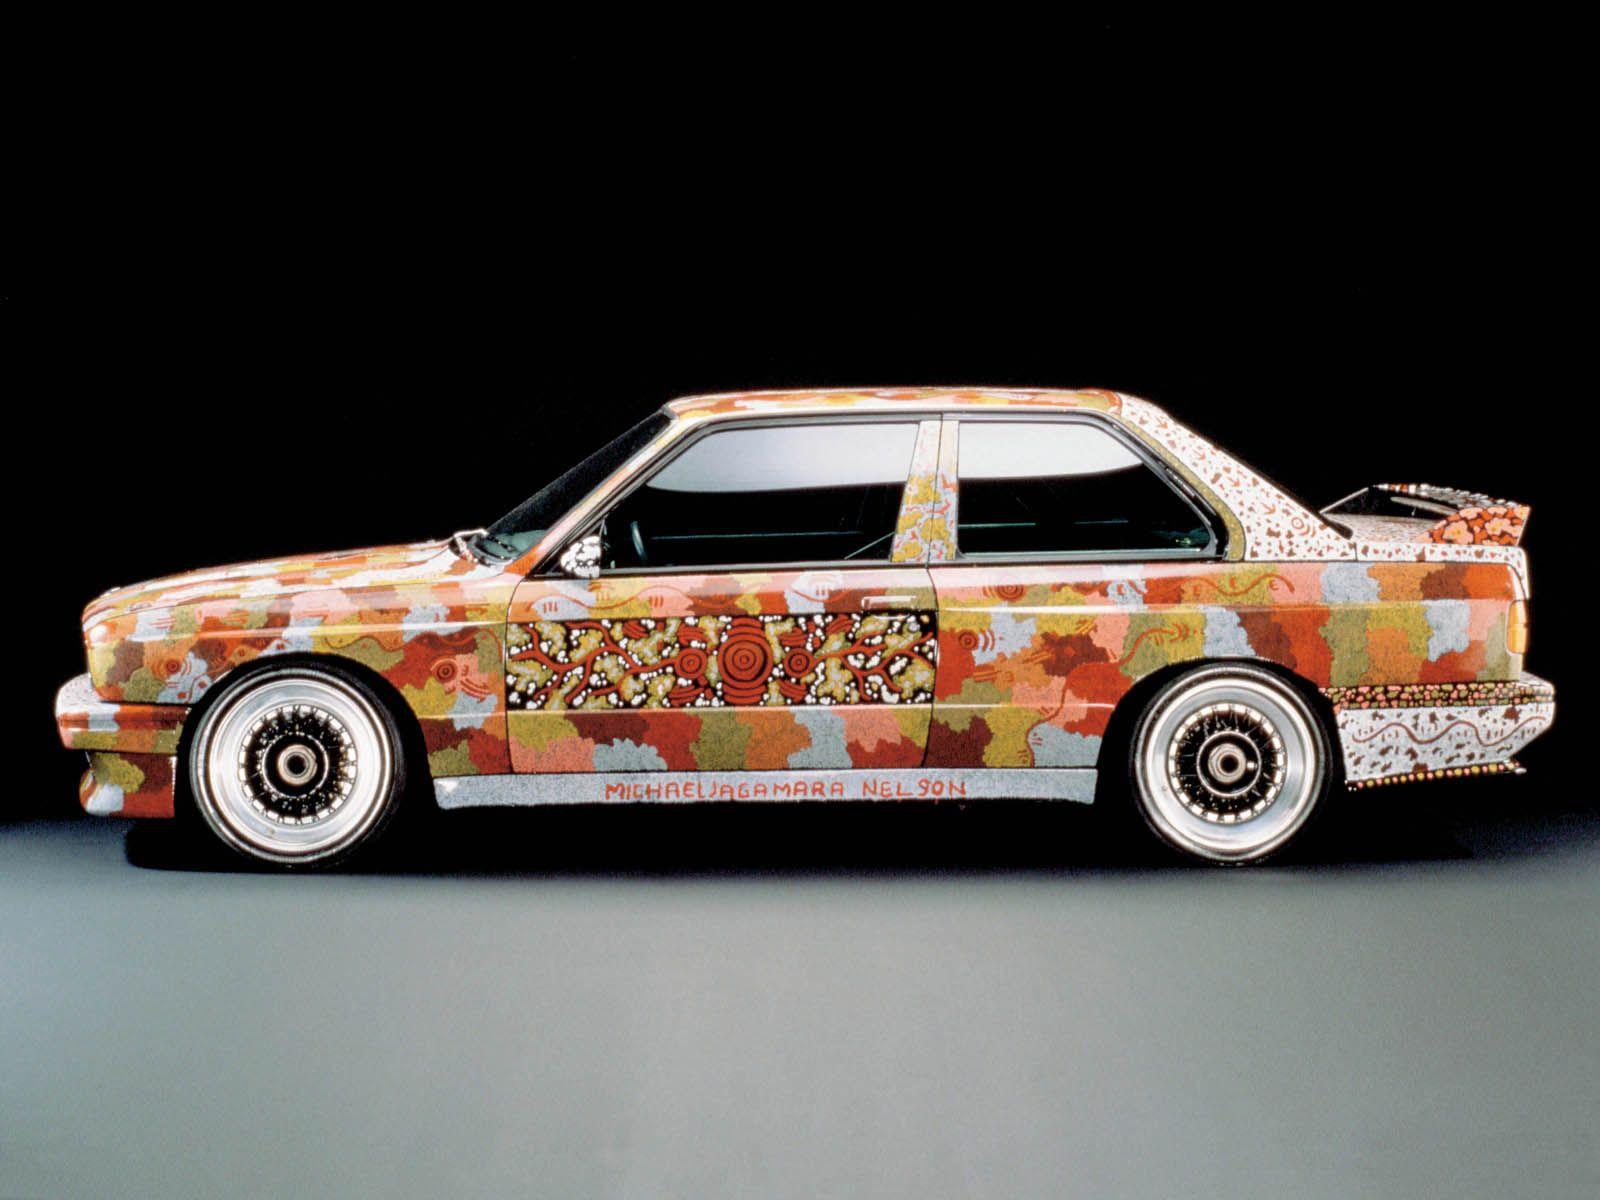 69f015af434ec3321d89c2ed75ab8404 Cool Bmw Z1 Joyas sobre Ruedas Cars Trend